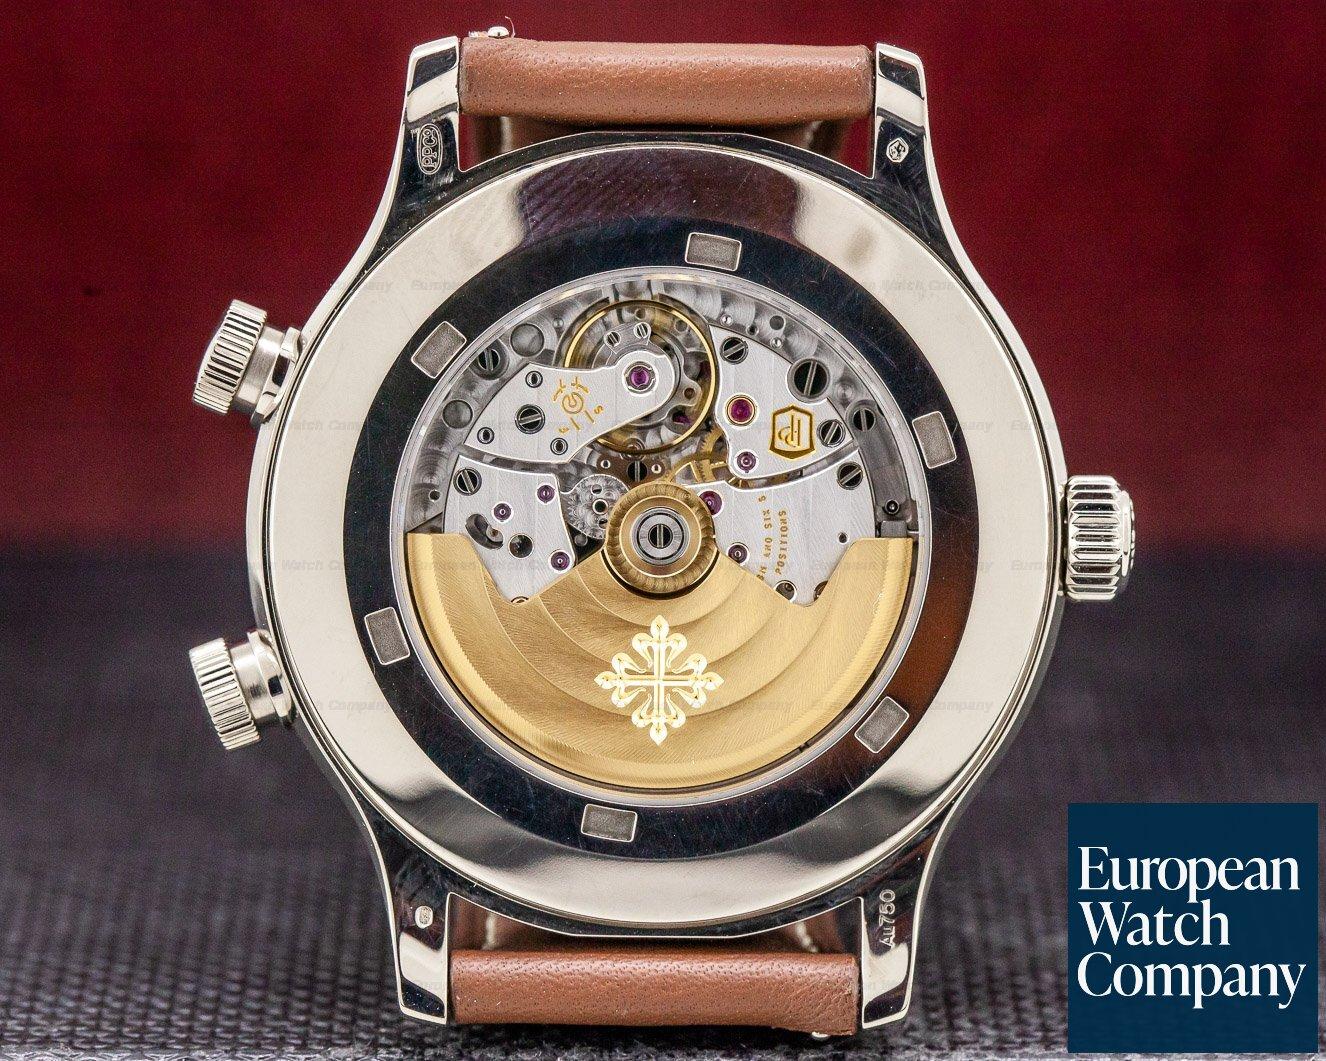 Patek Philippe 5524G-001 Calatrava Pilot Travel Time 18k White Gold